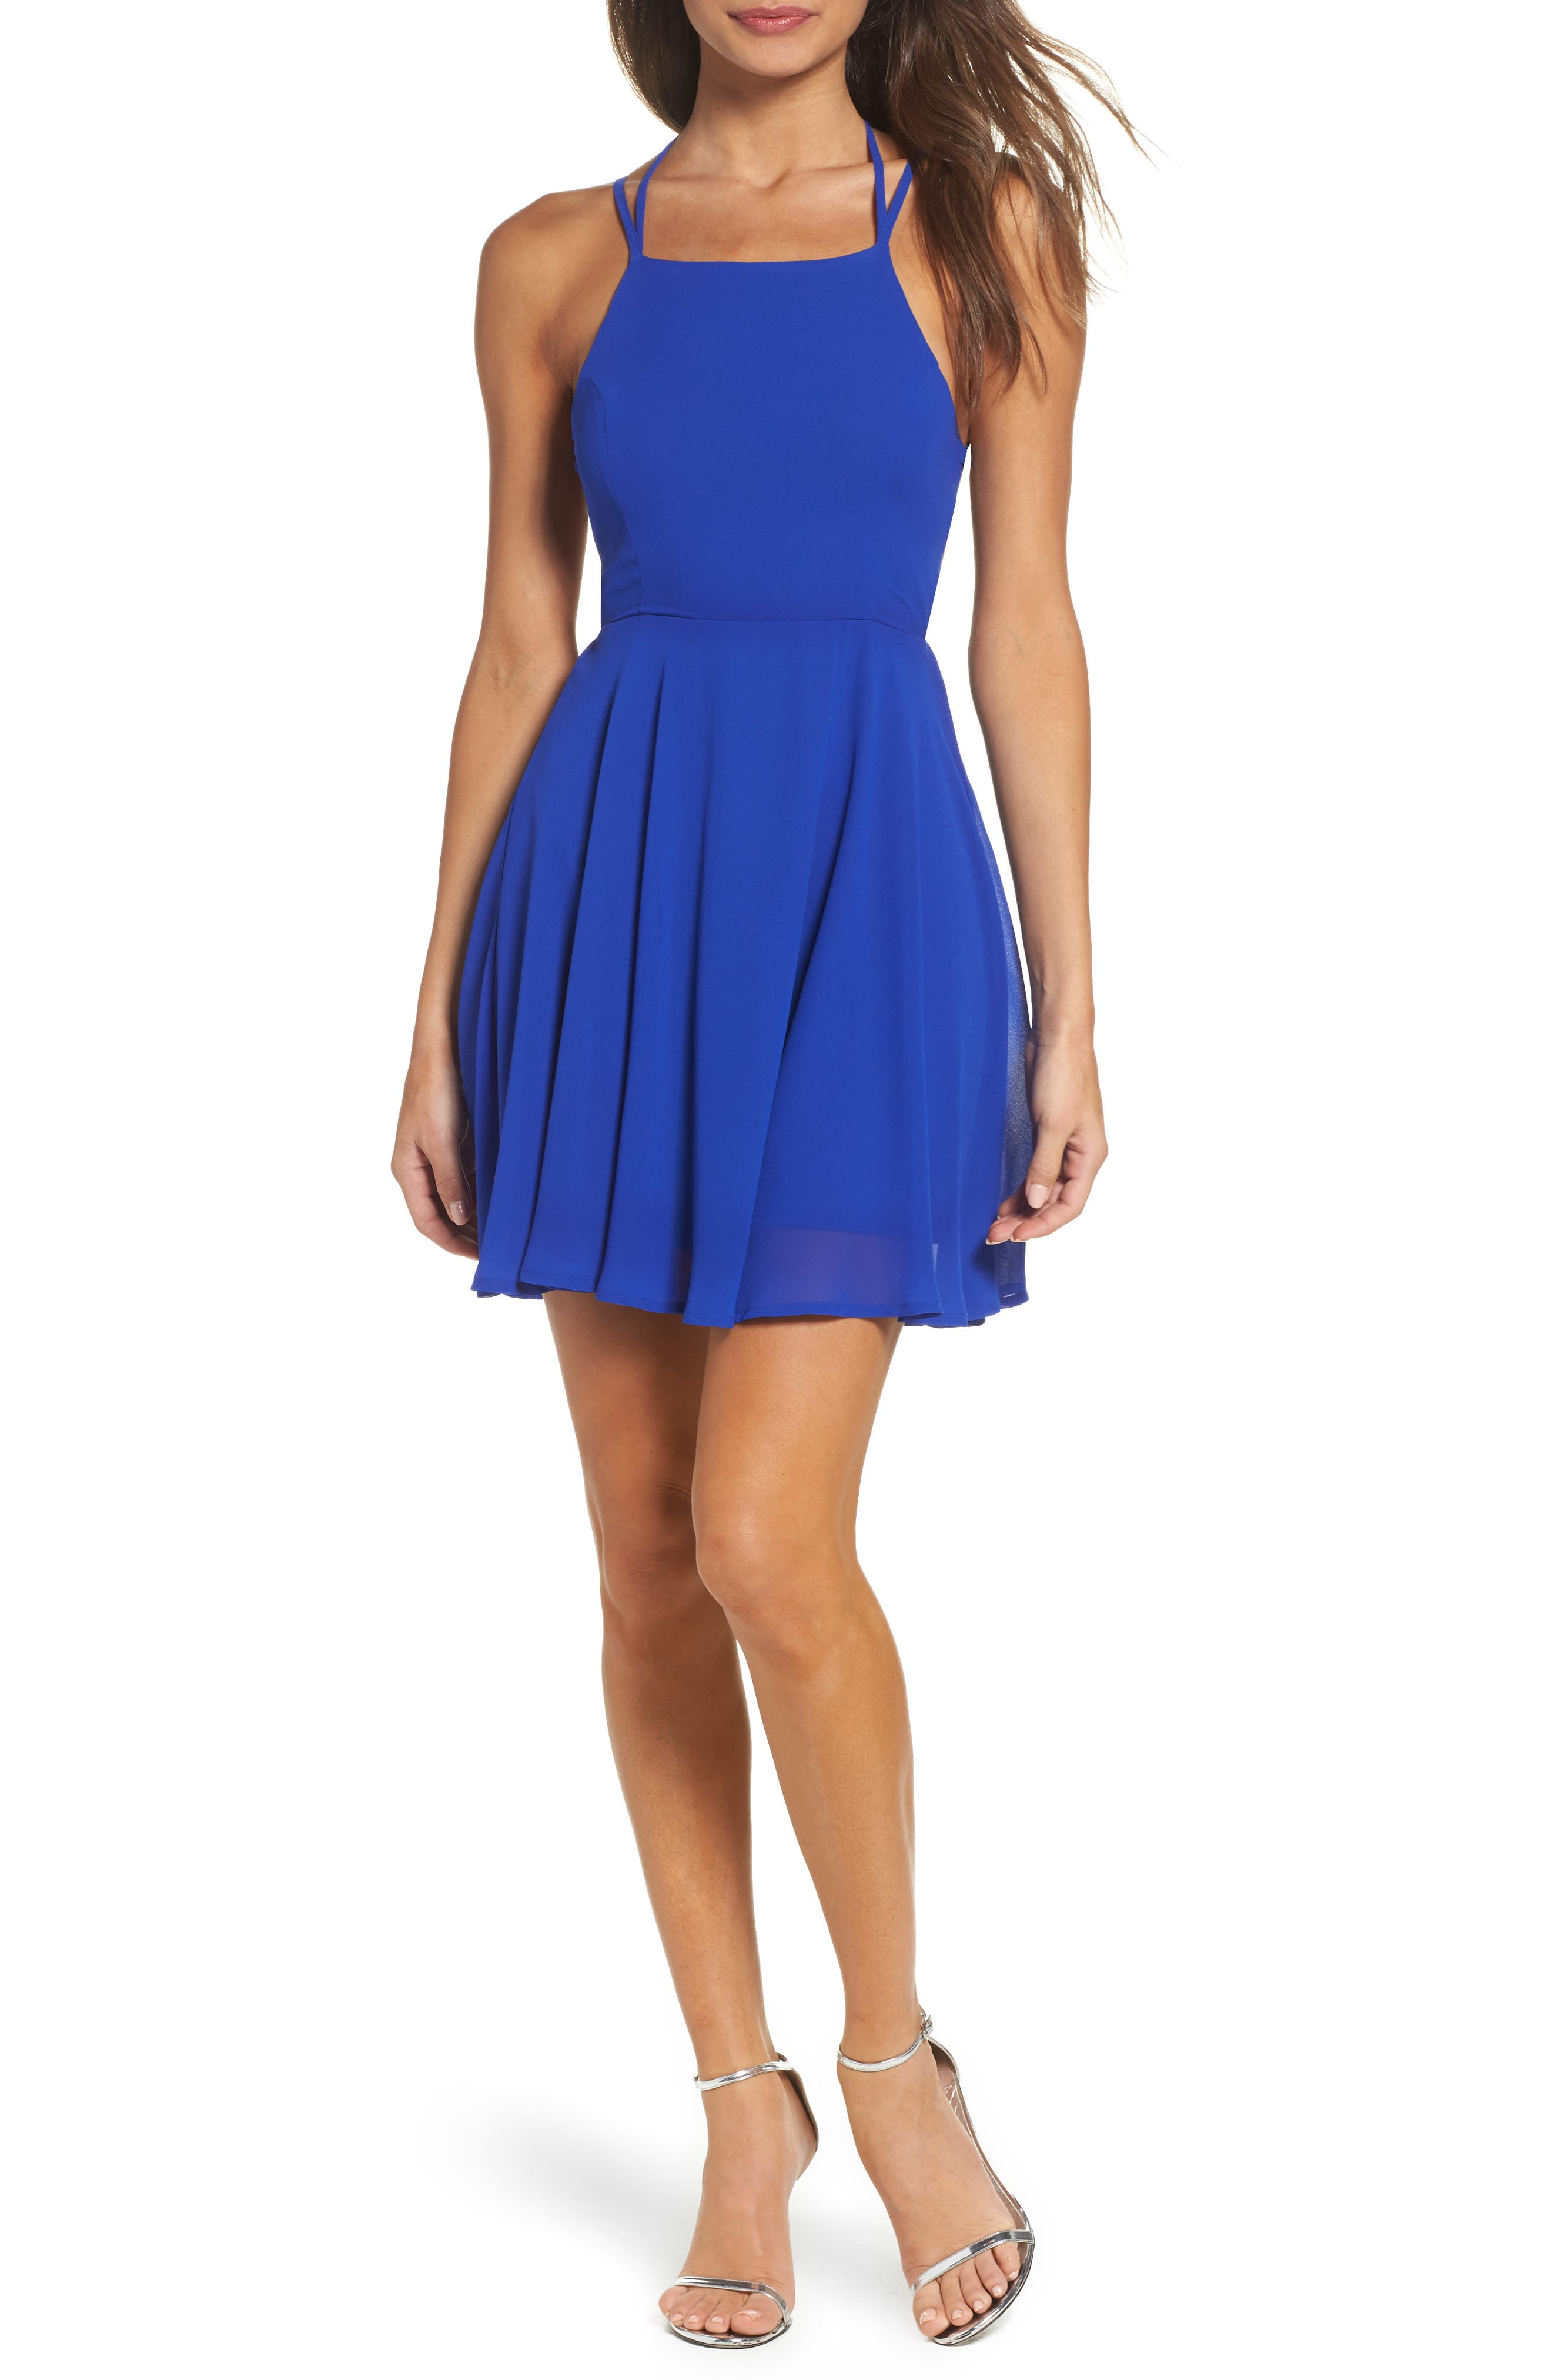 LULUS Good Deeds Lace-Up Skater Dress, Main, color, ROYAL BLUE